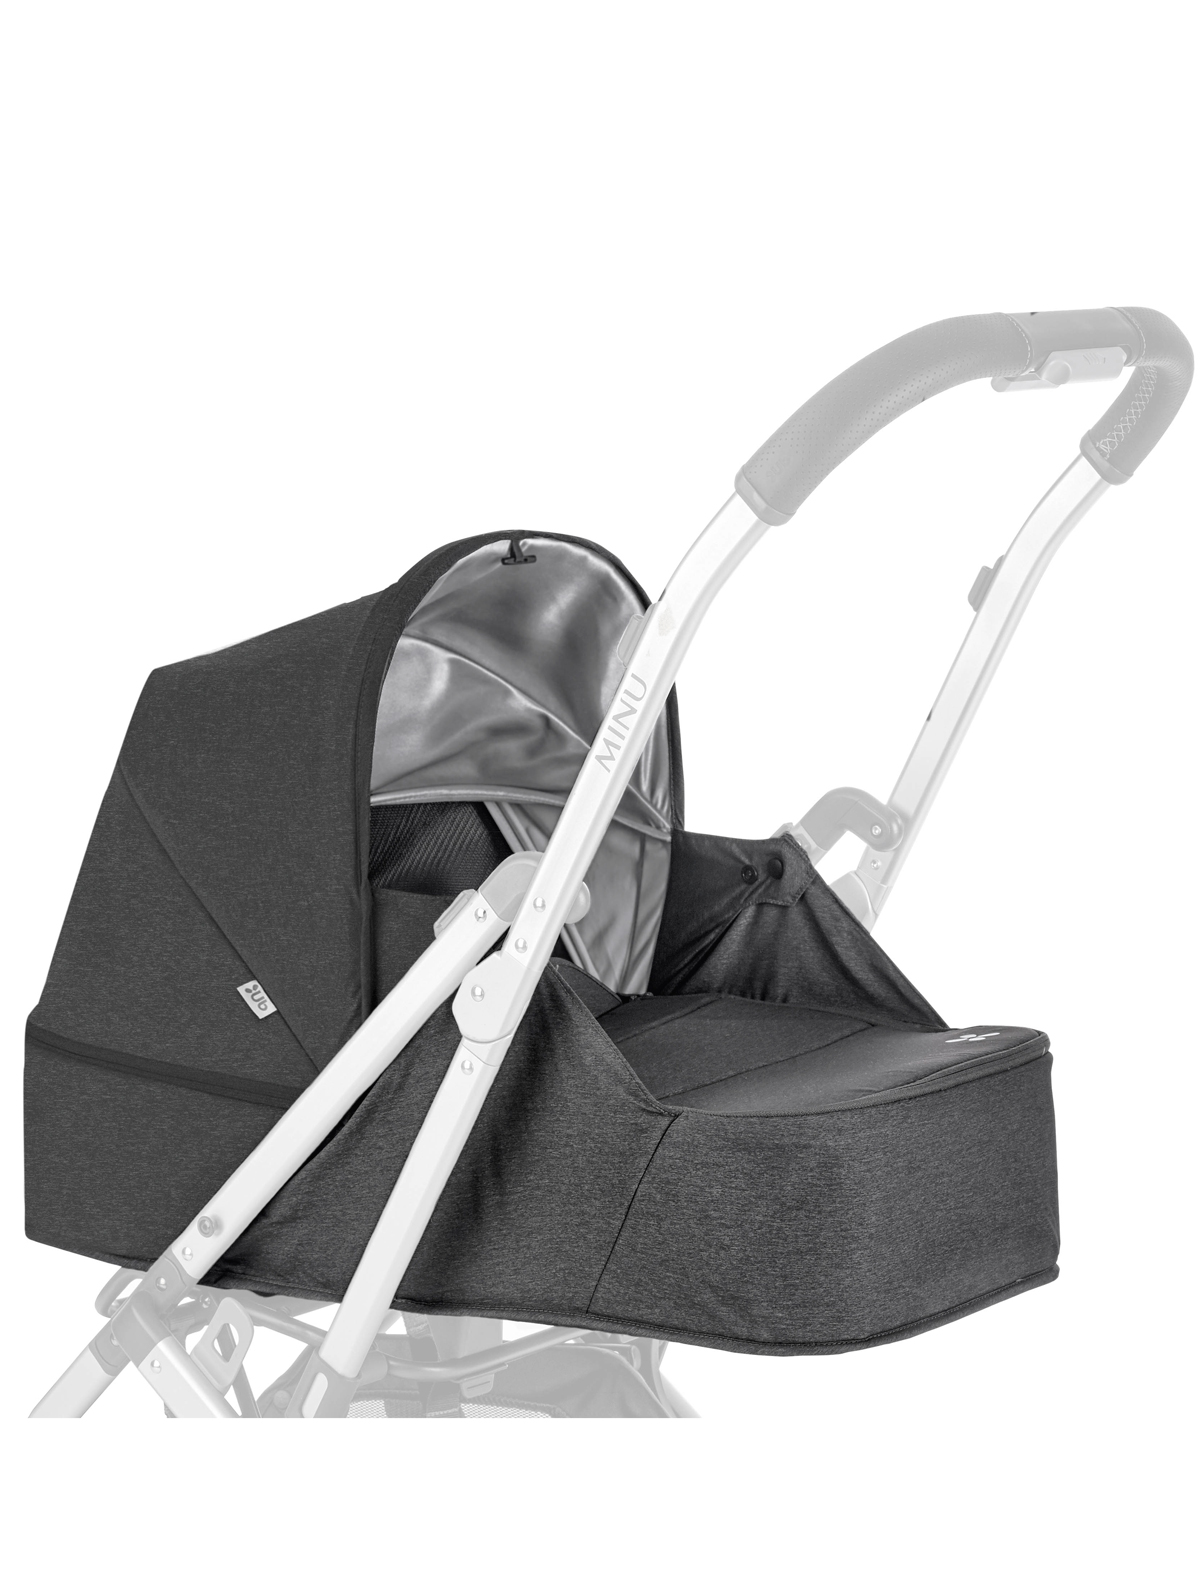 Аксессуар для коляски UPPAbaby 2152446 серого цвета